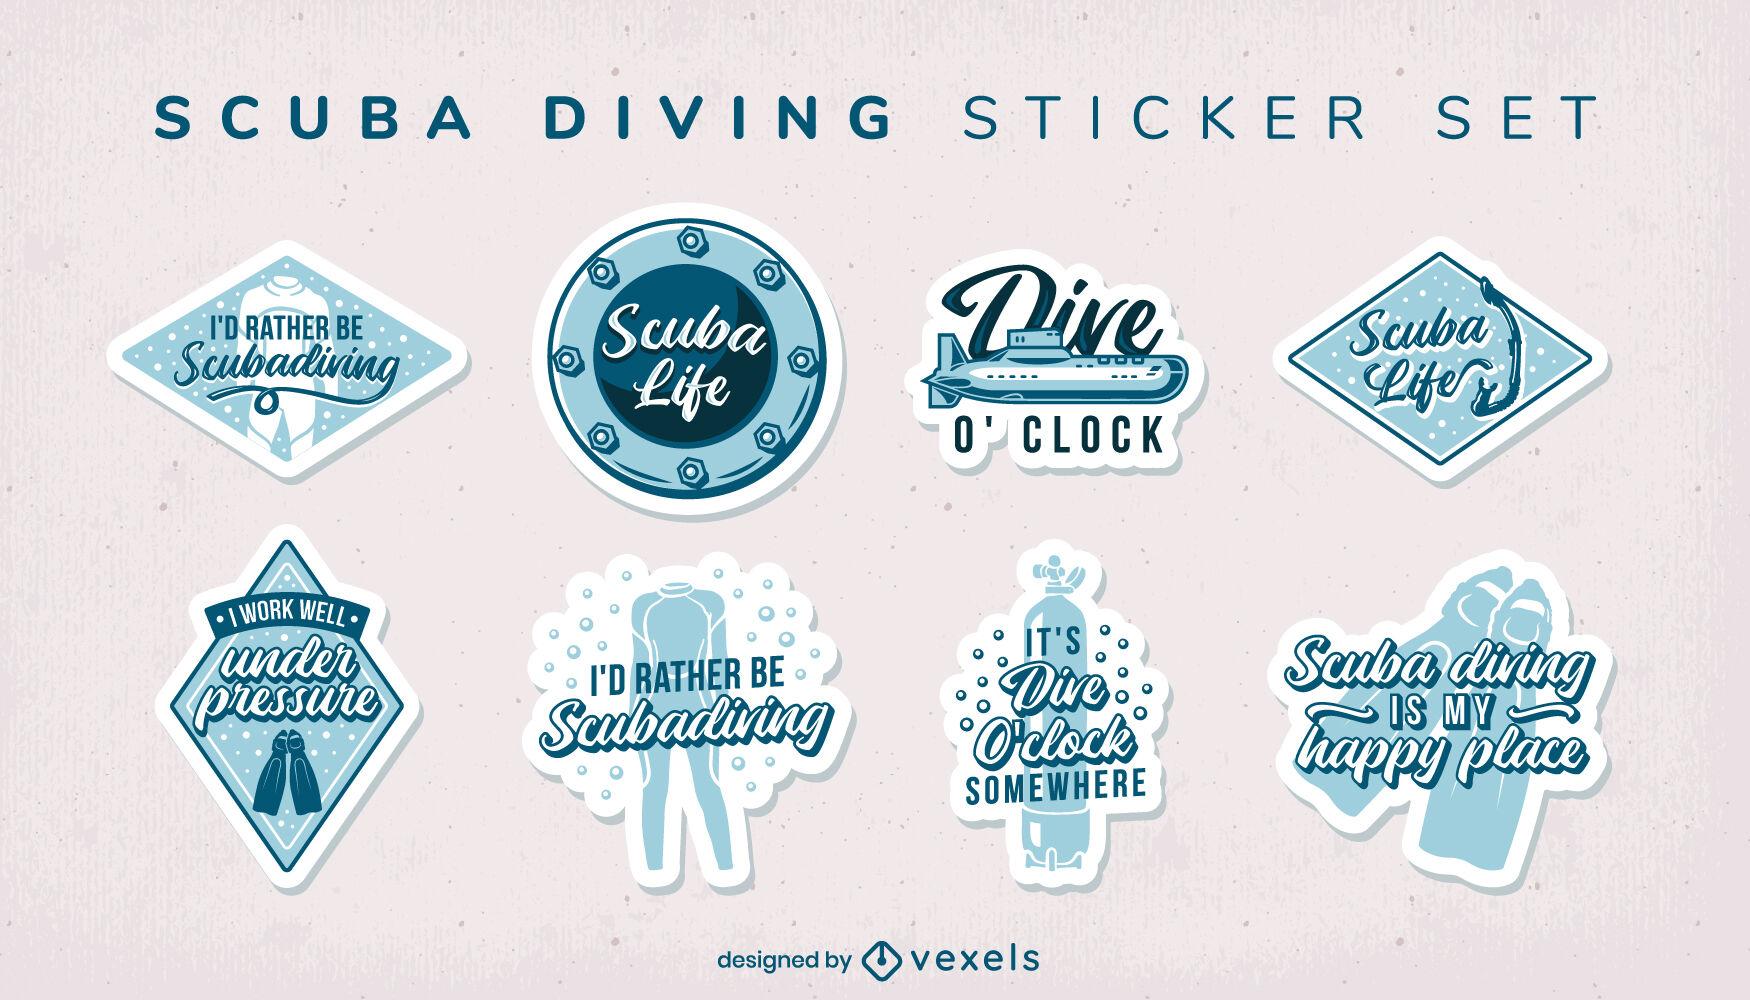 Scuba diving funny quotes sticker set